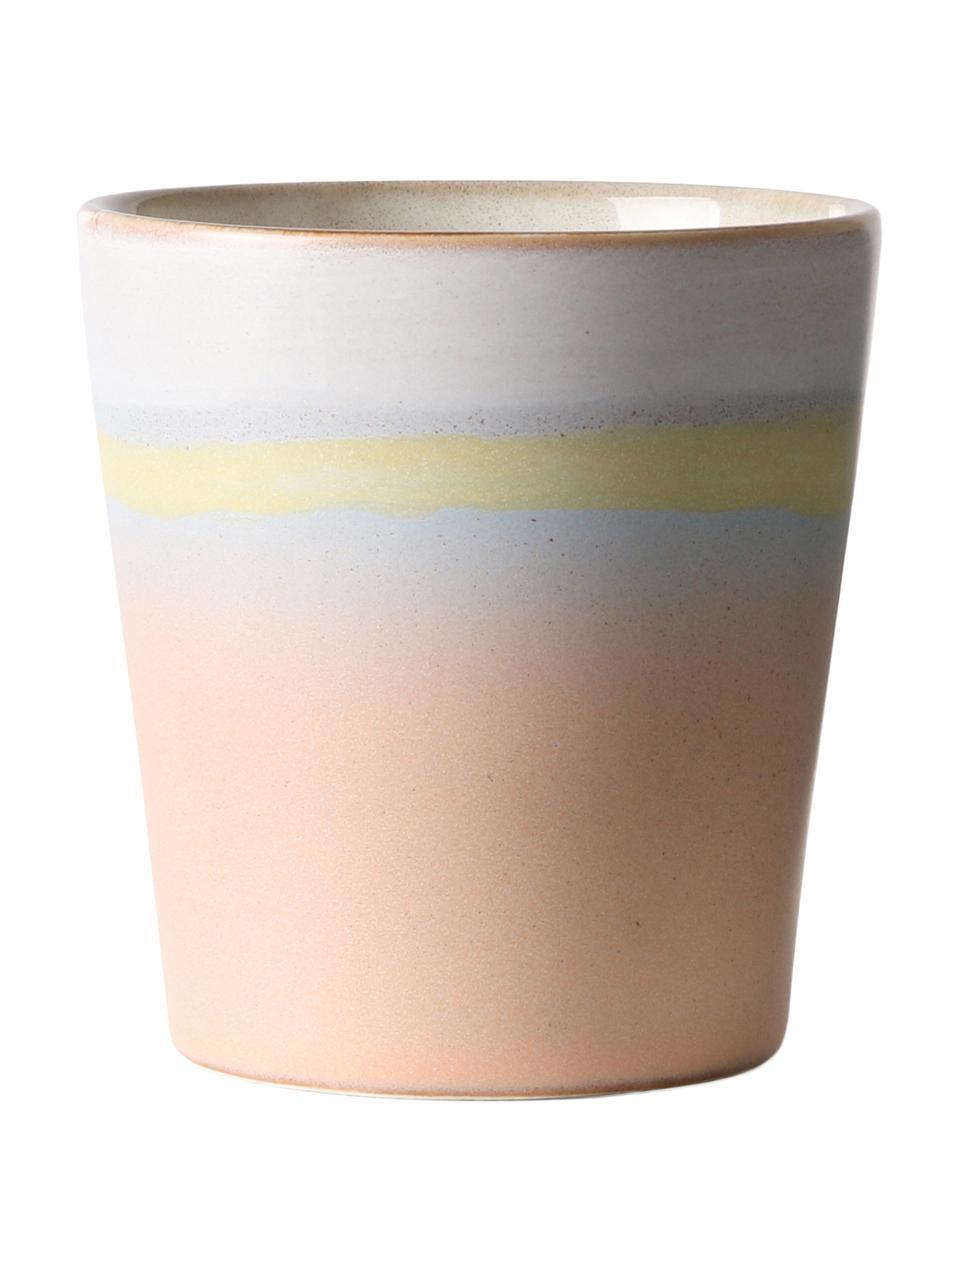 Handgemaakte XS-bekerset 70's, 2-delig, Keramiek, Multicolour, Ø 8 x H 8 cm